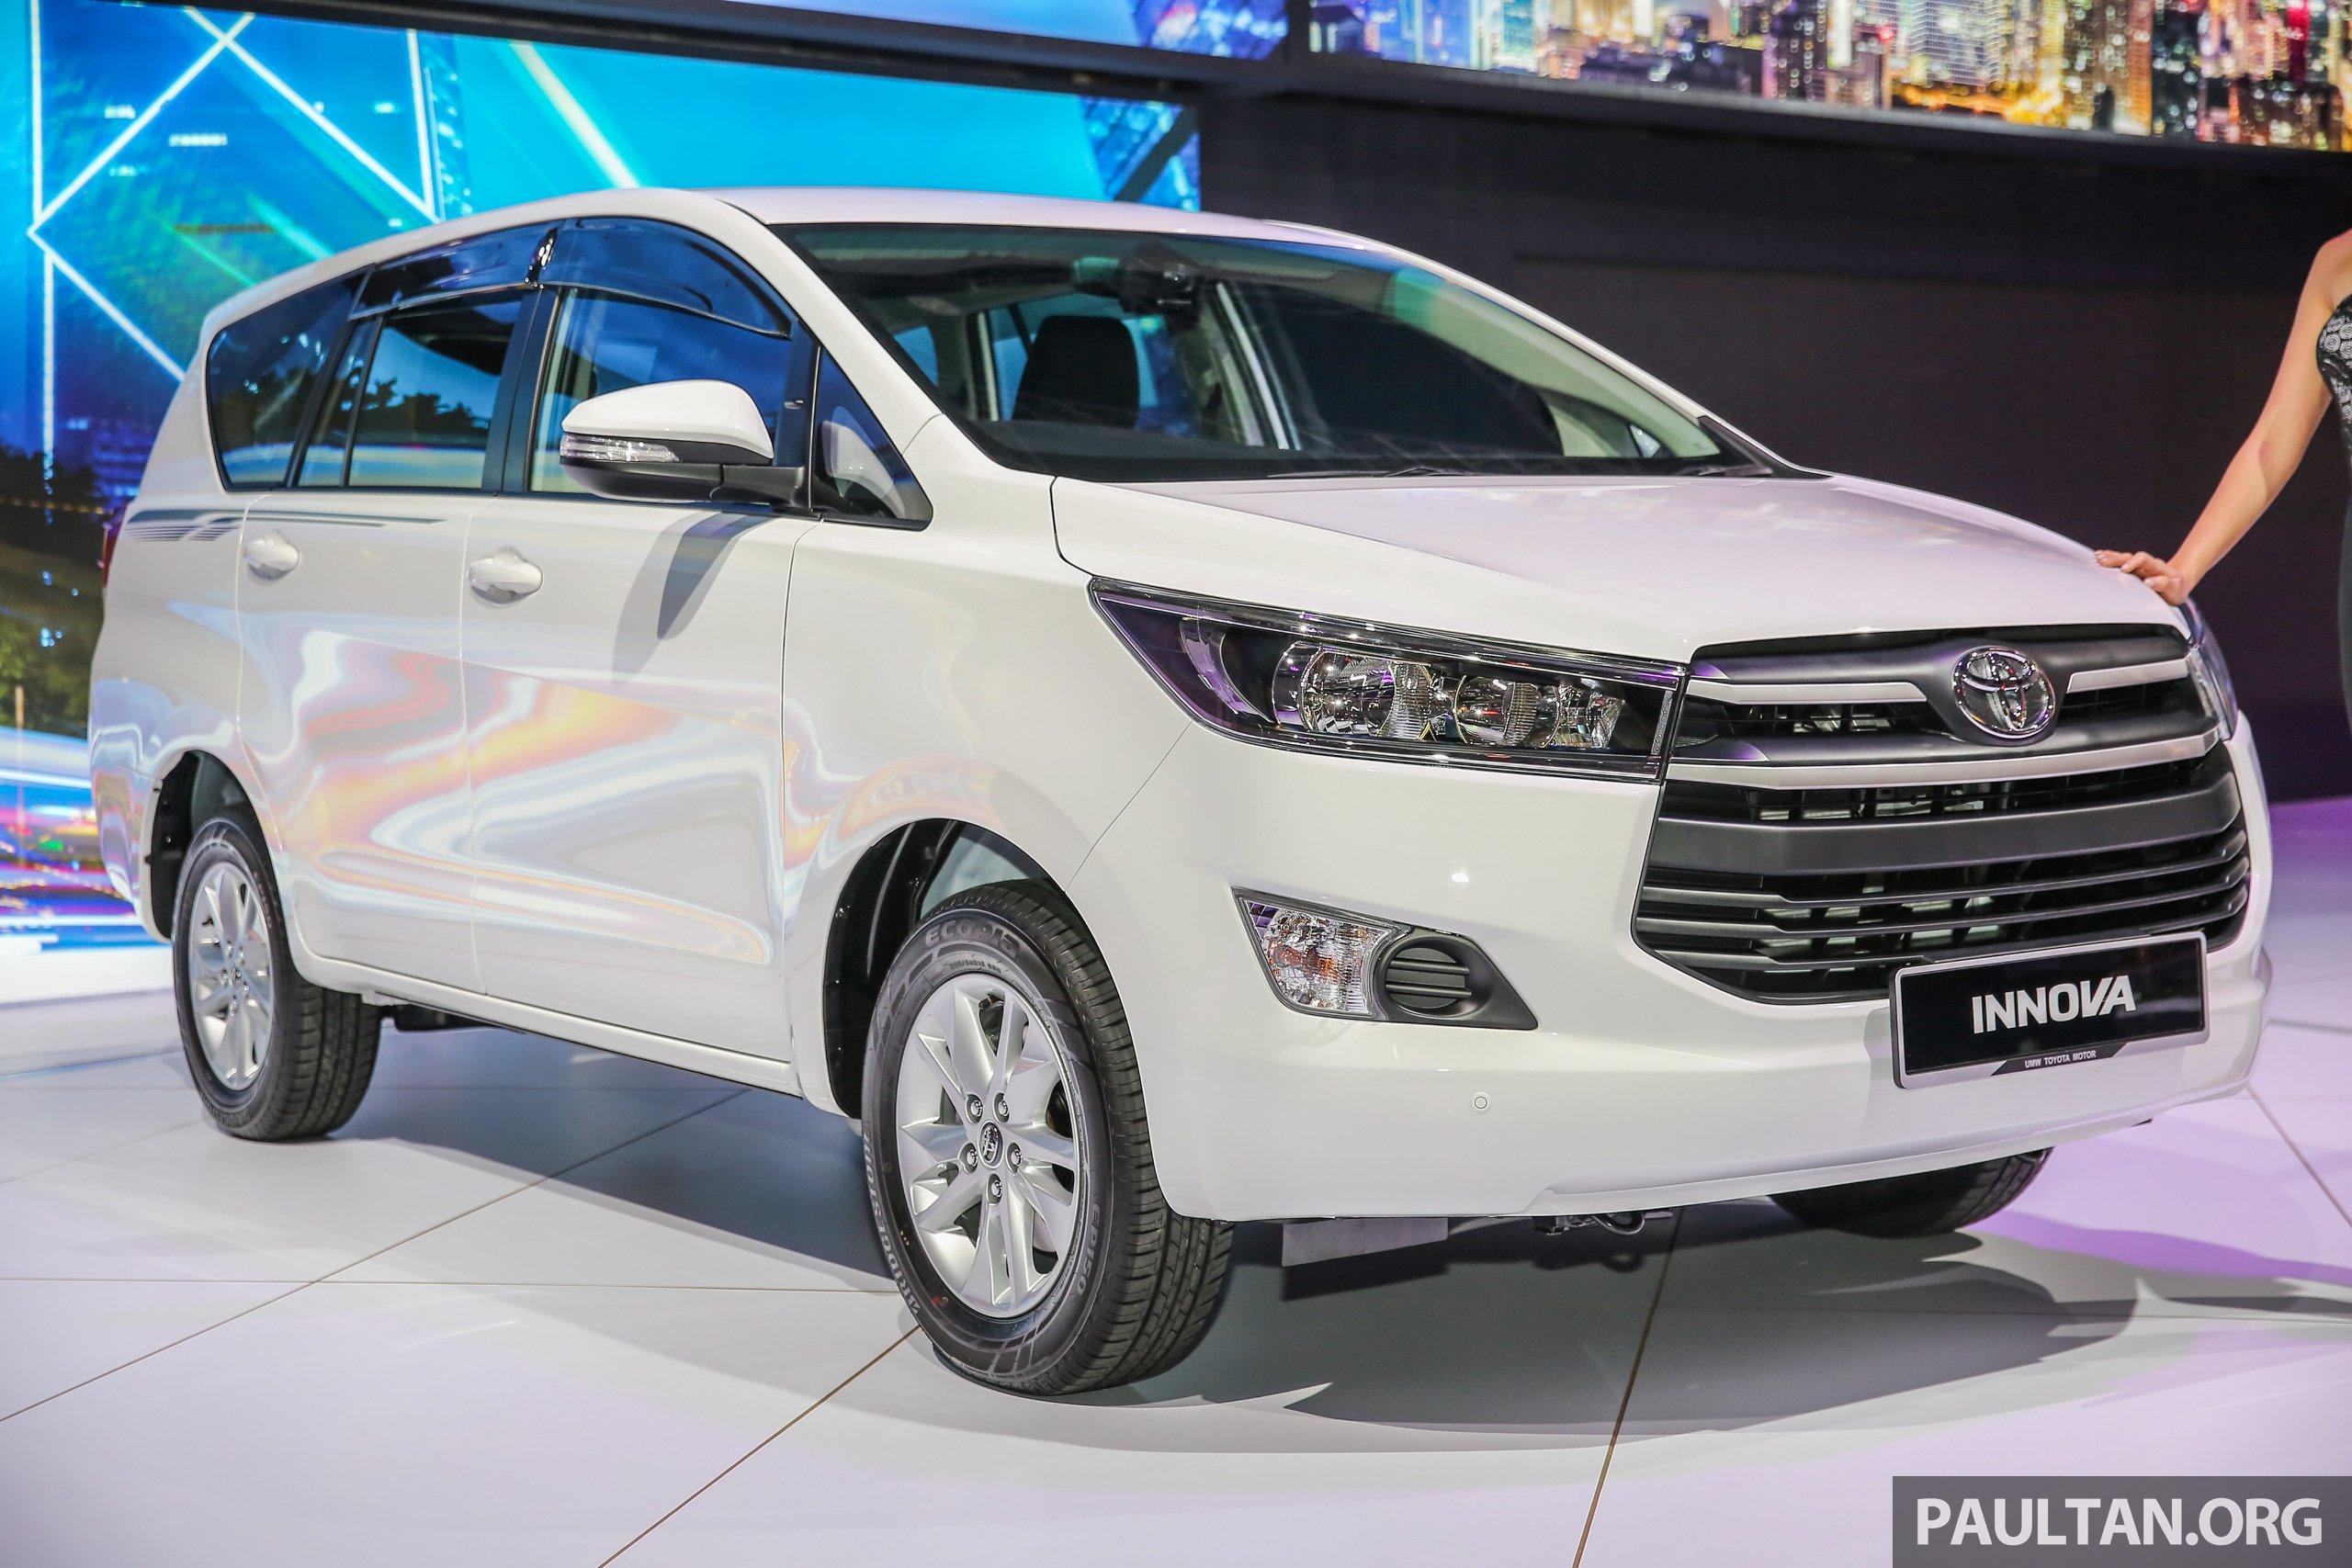 Toyota Innova Diesel Engine Considered For M Sia